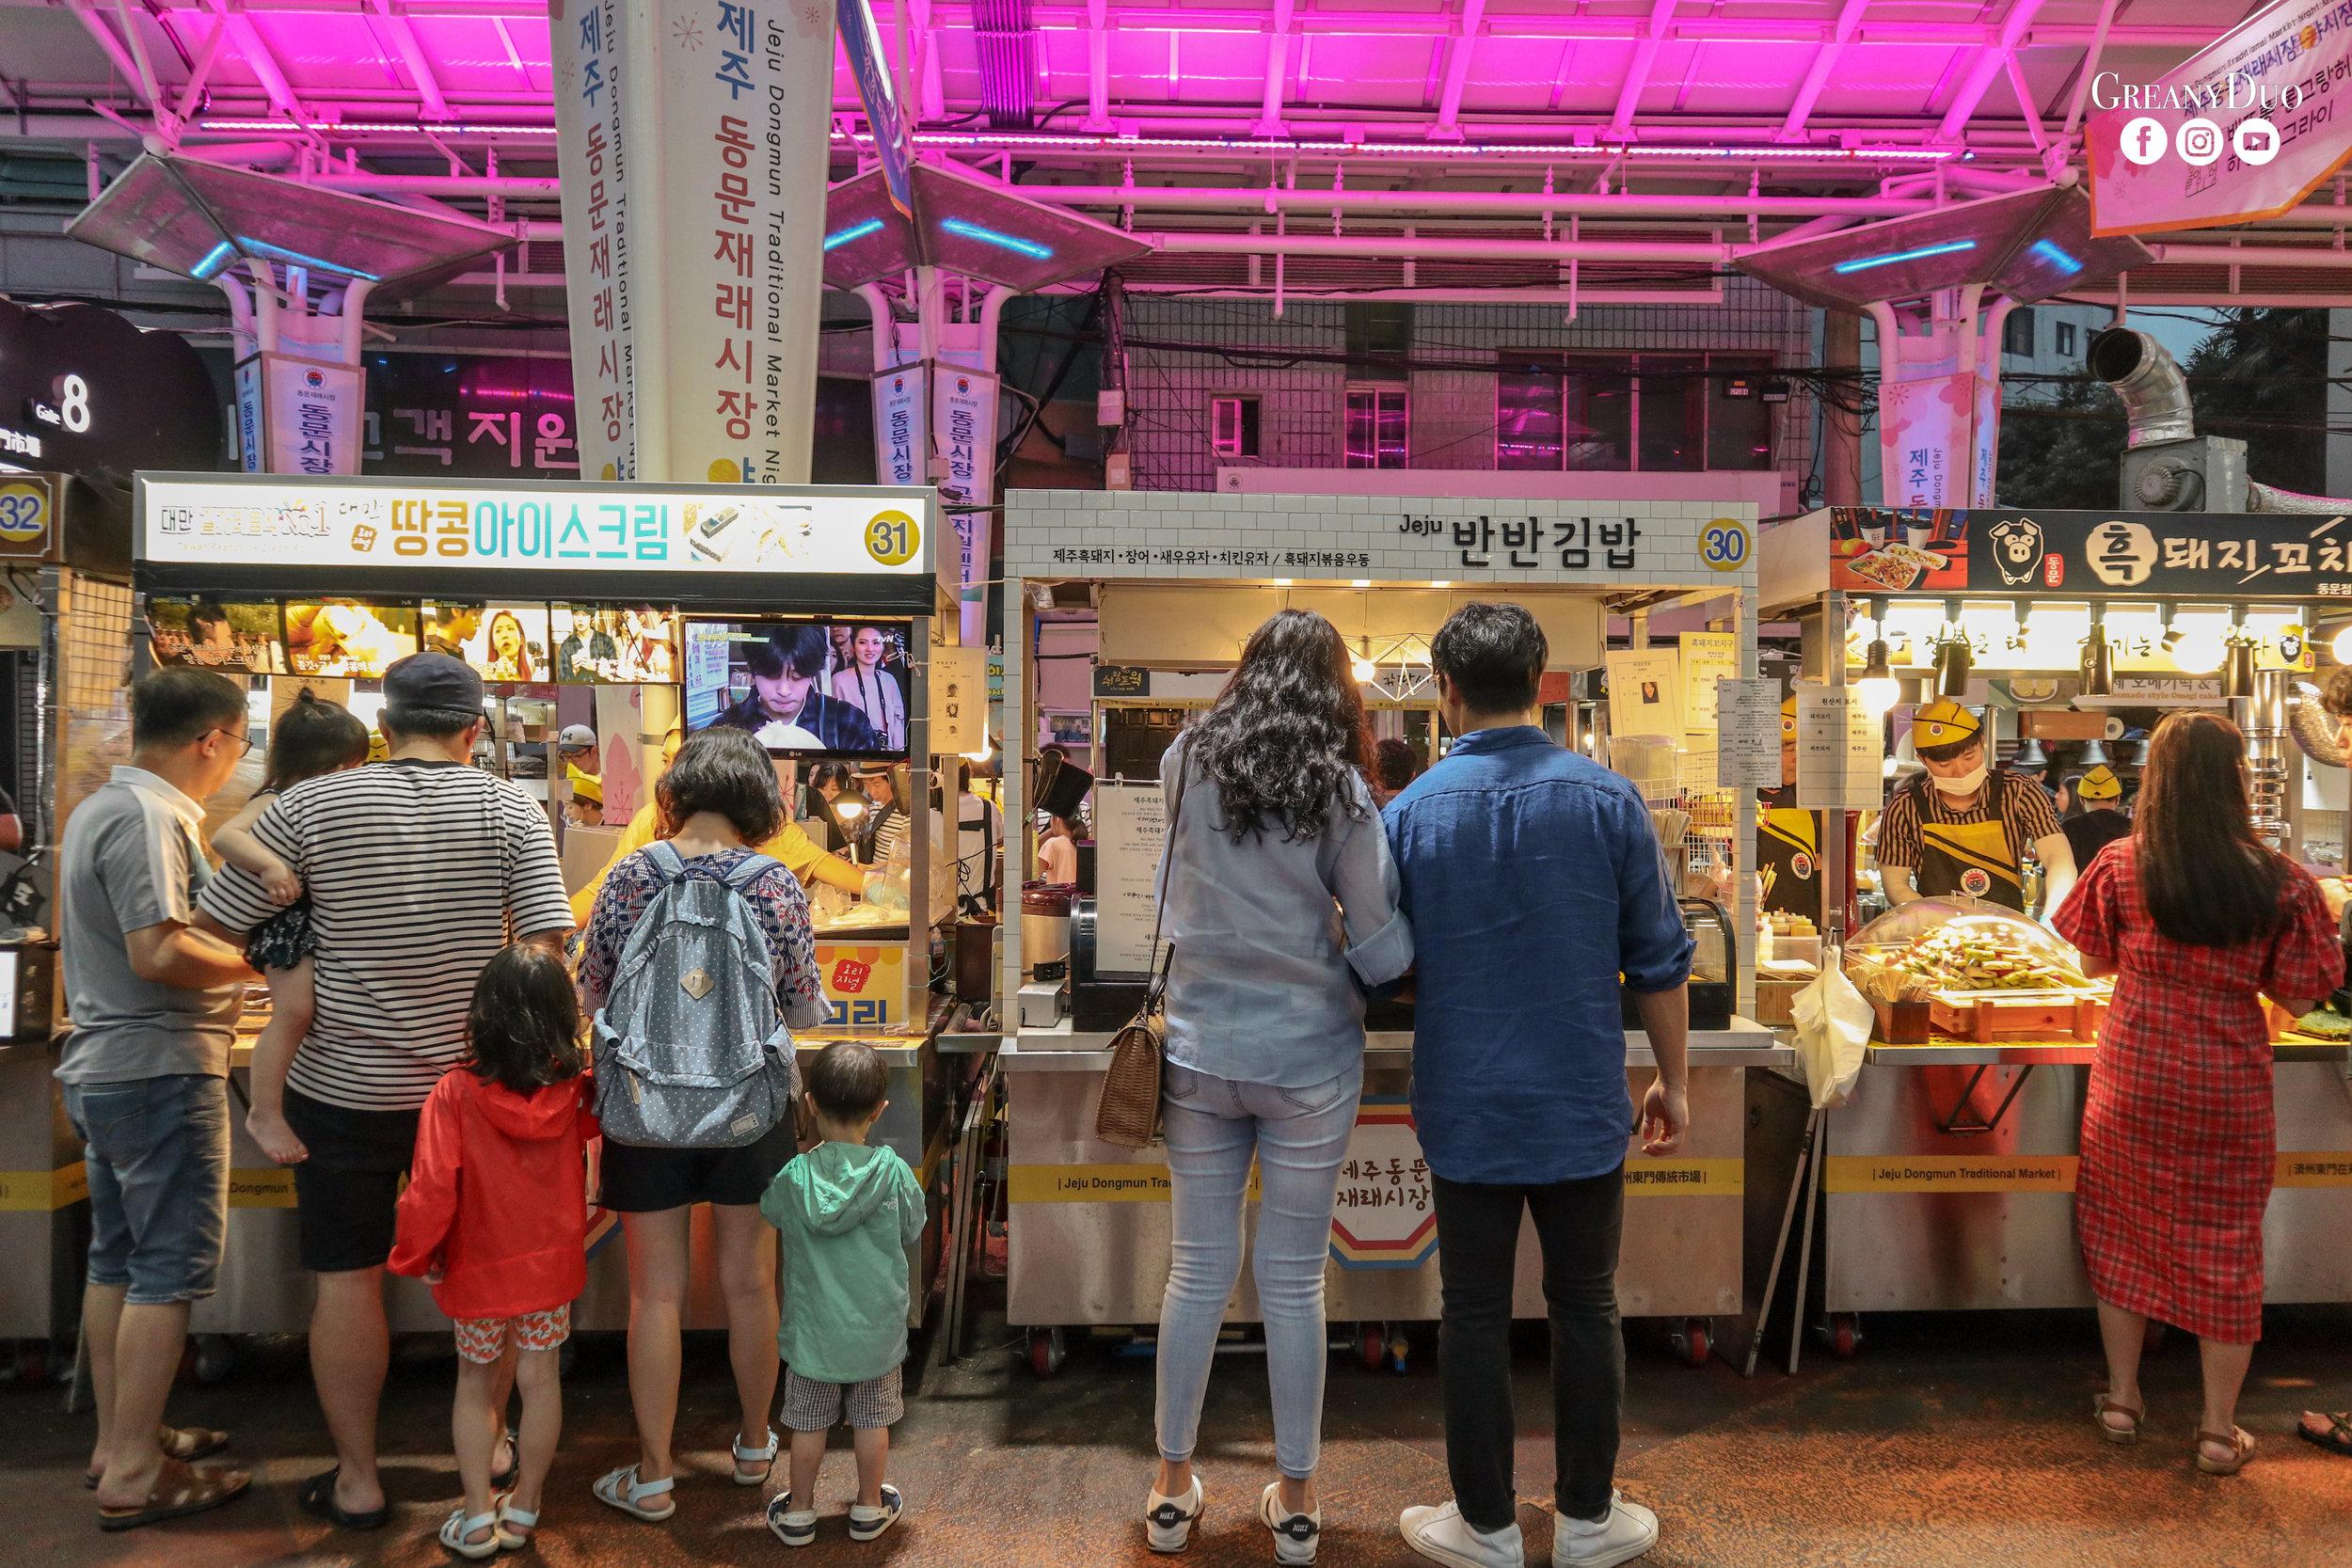 dongmun night market, jeju